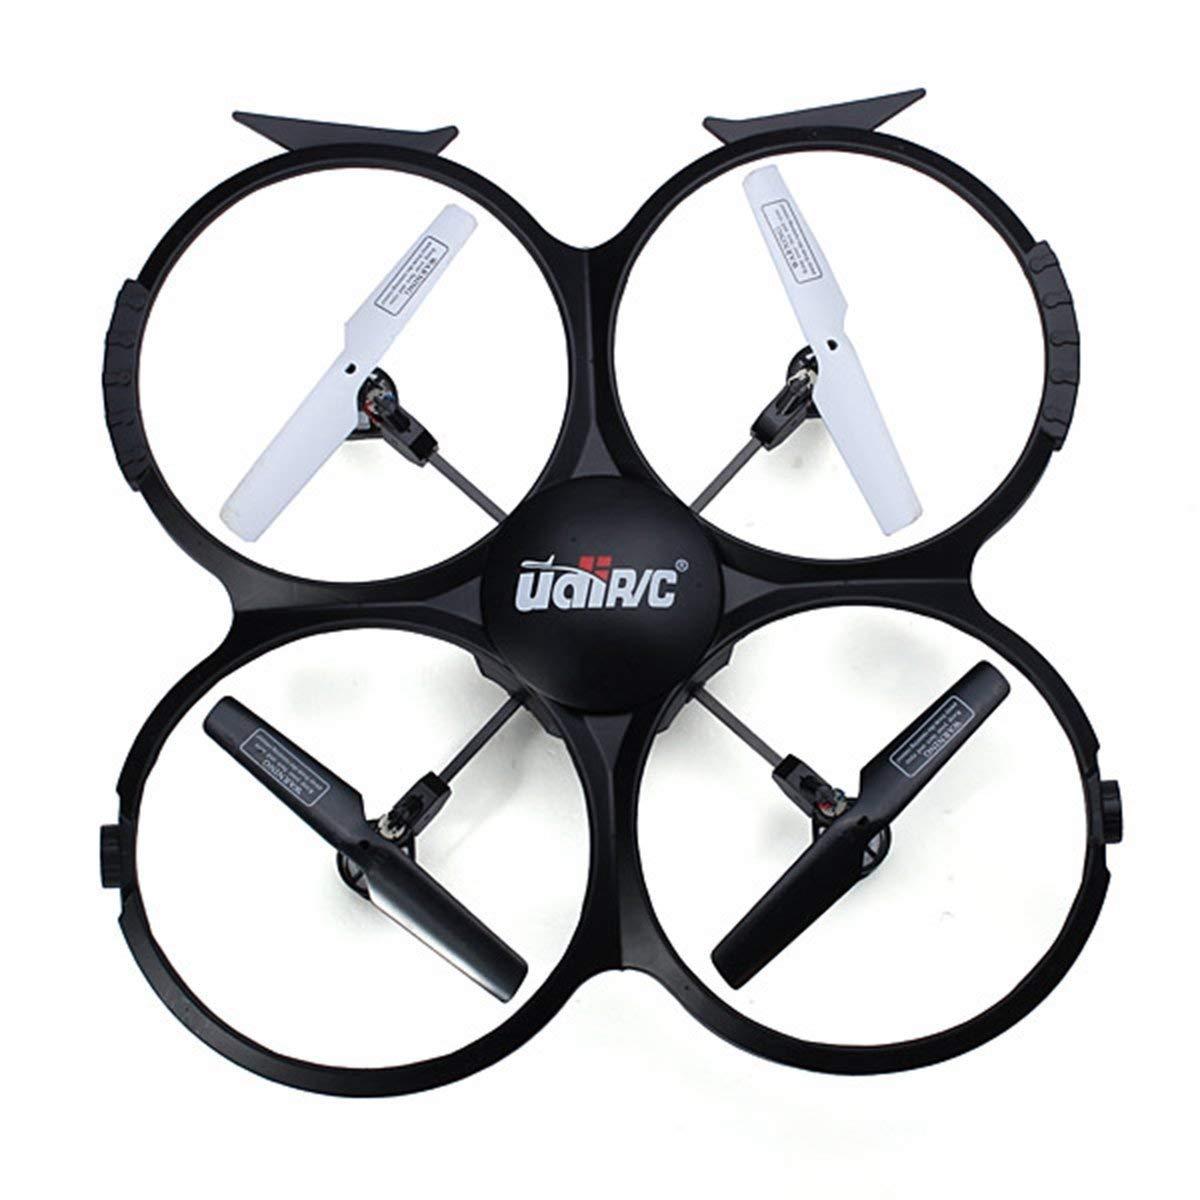 Daye Drohne mit Kamera UDI U818A-HD 2,4 GHz 4 CH 6 AXIS RC Quadcopter Drohne 720P HD Videokamera, Return Home Headless-Modus-Funktion